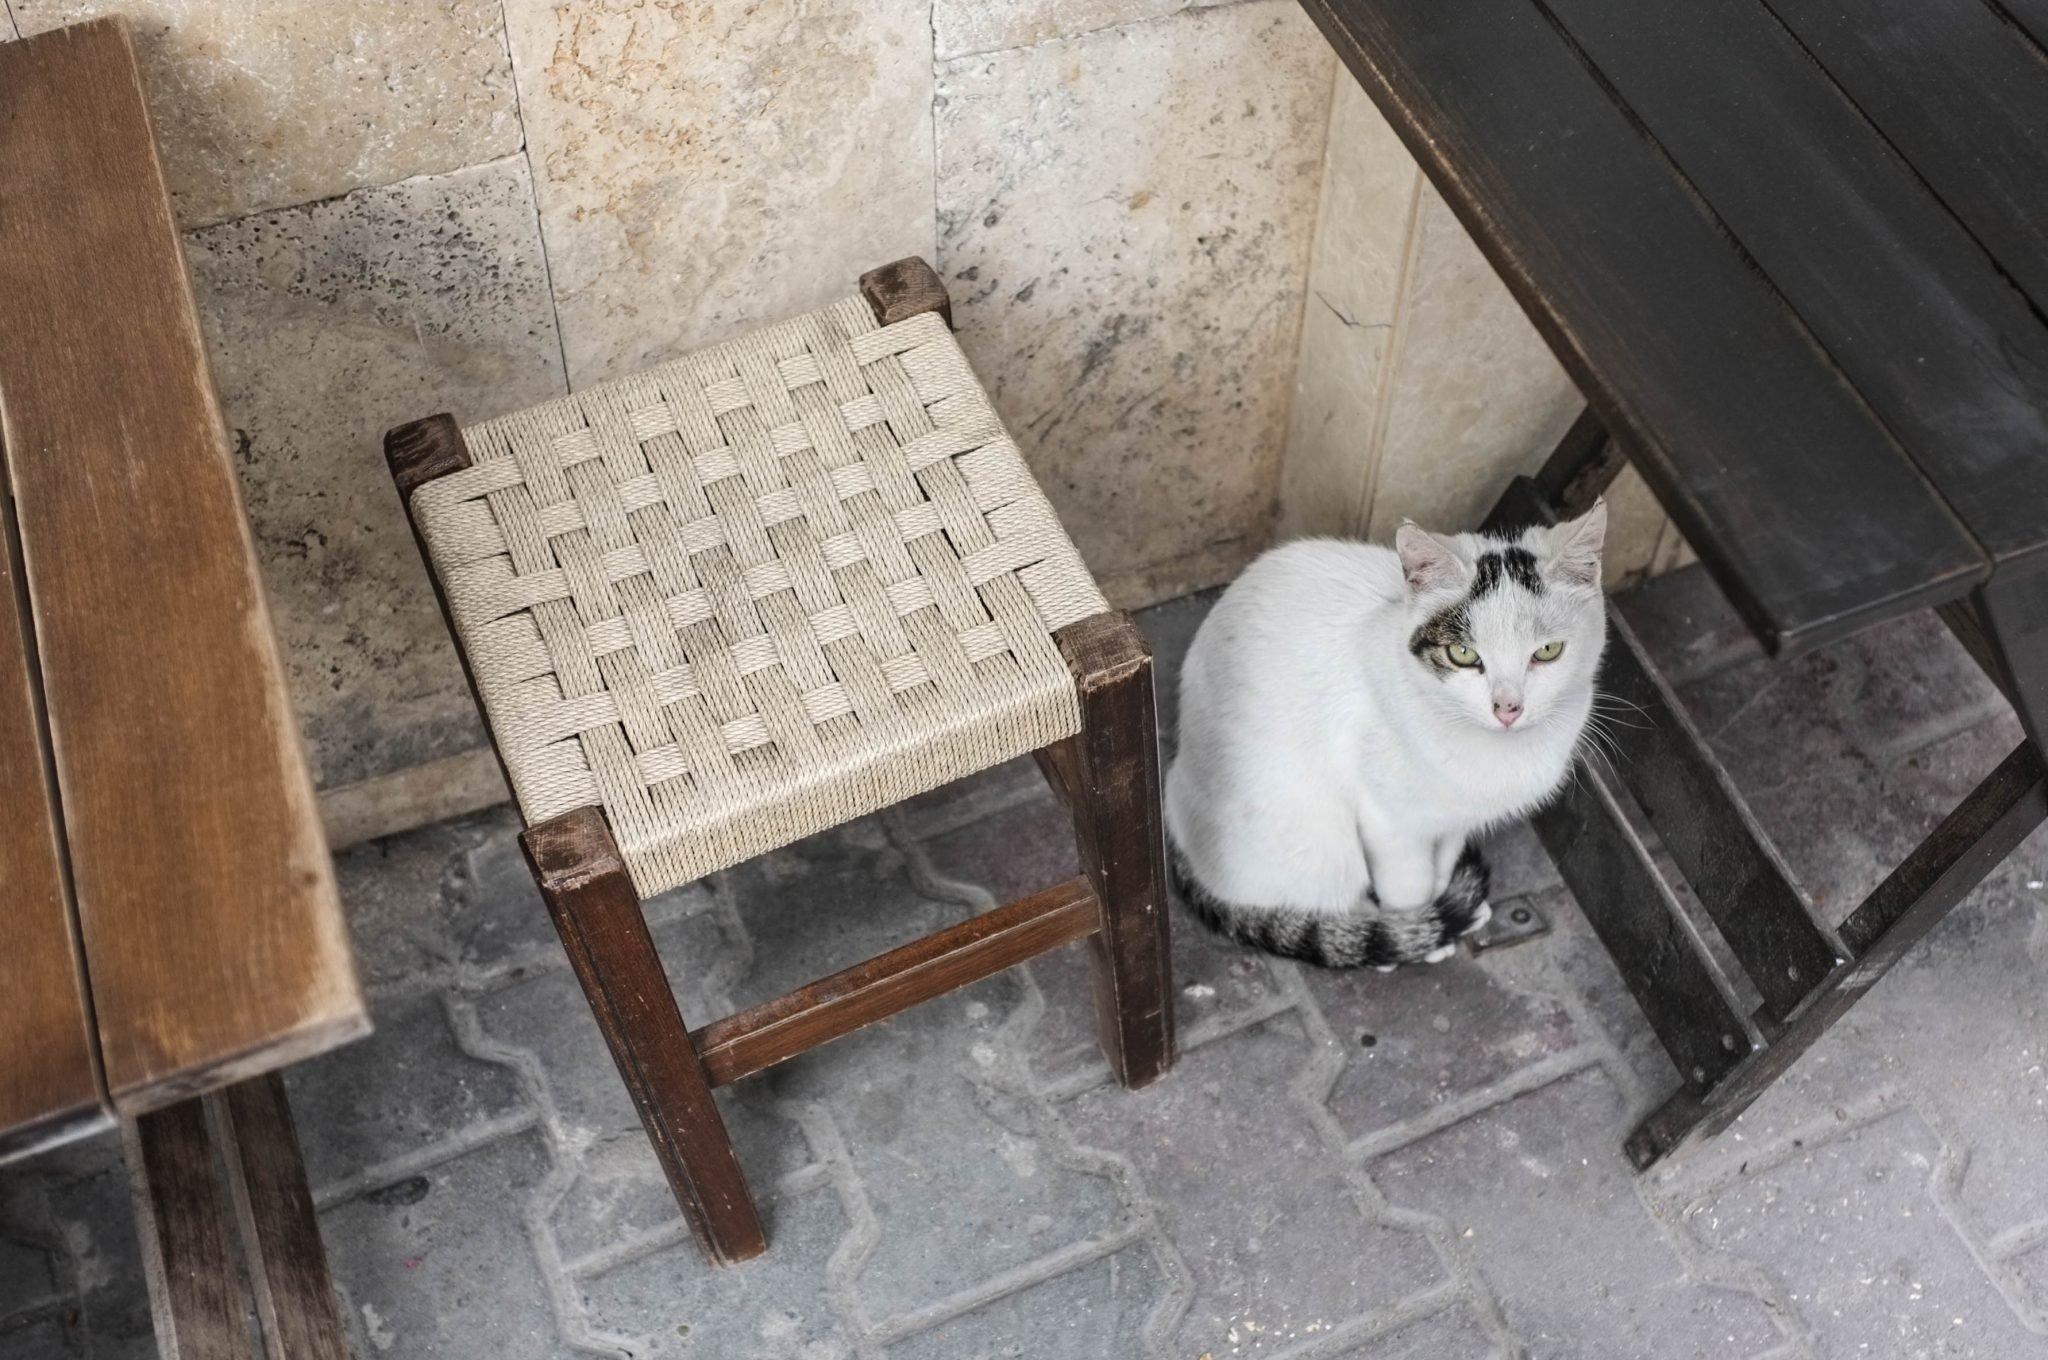 kissa ravintolan pöydän alla